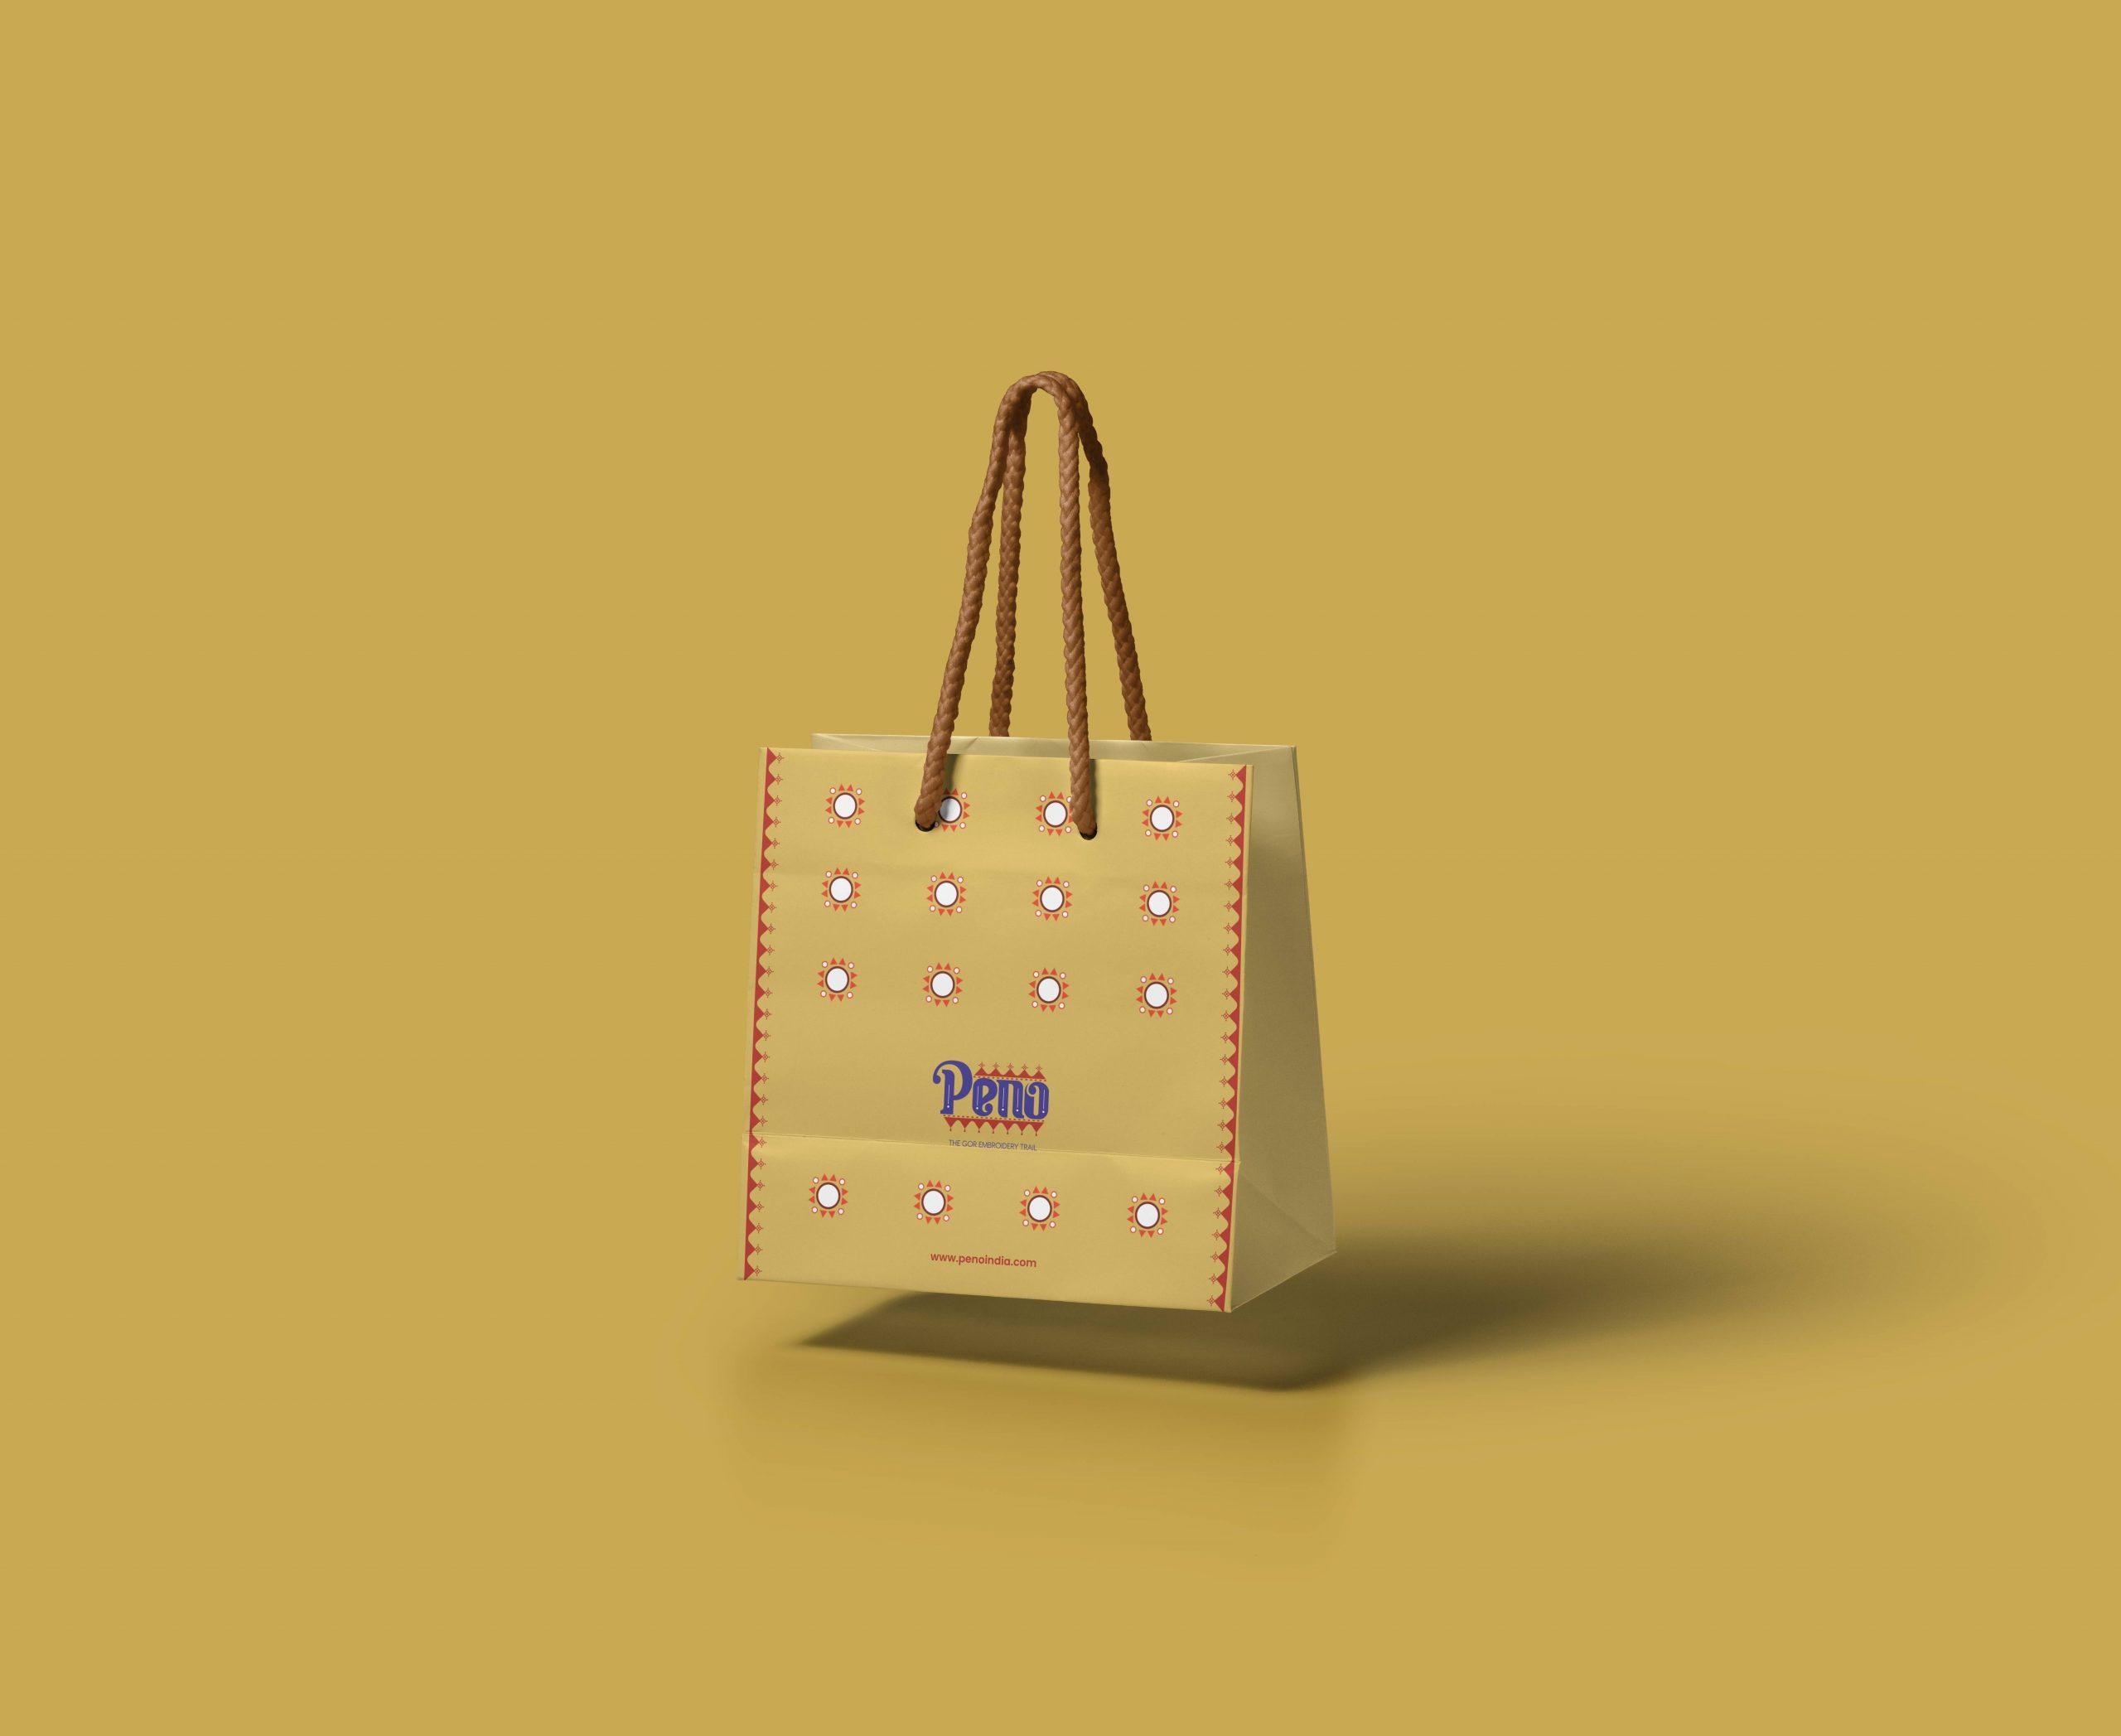 Peno Shopping Bag Design by WDSOFT